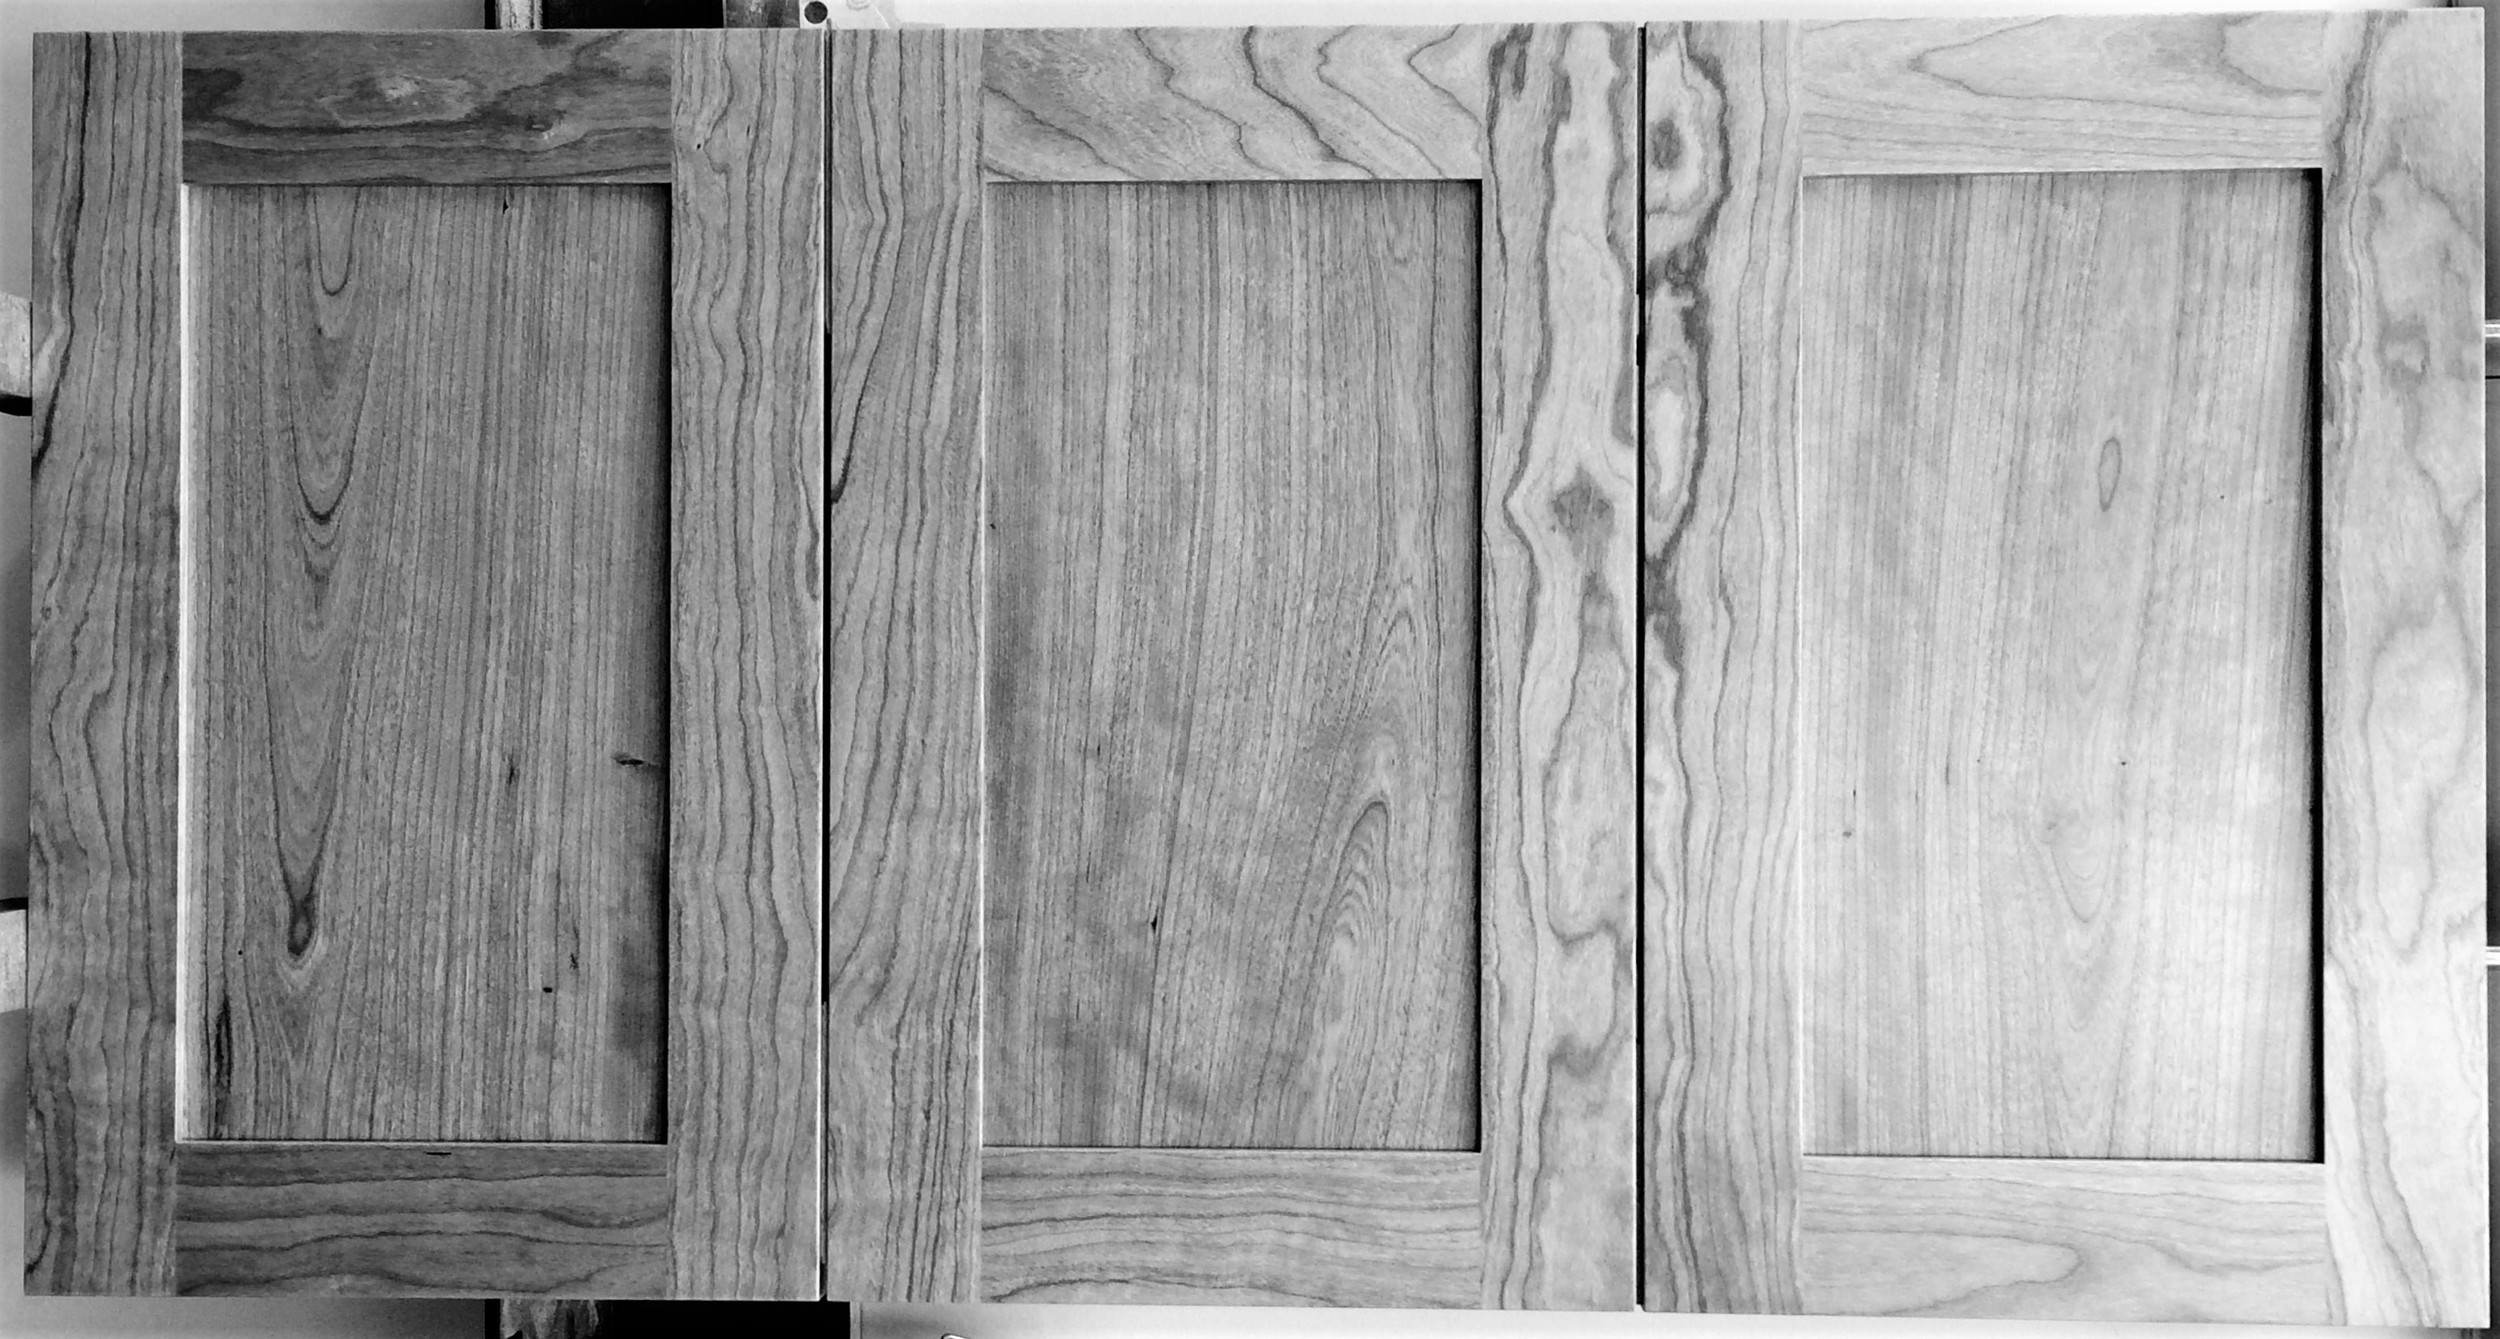 Grain matched Shaker style cherry doors.